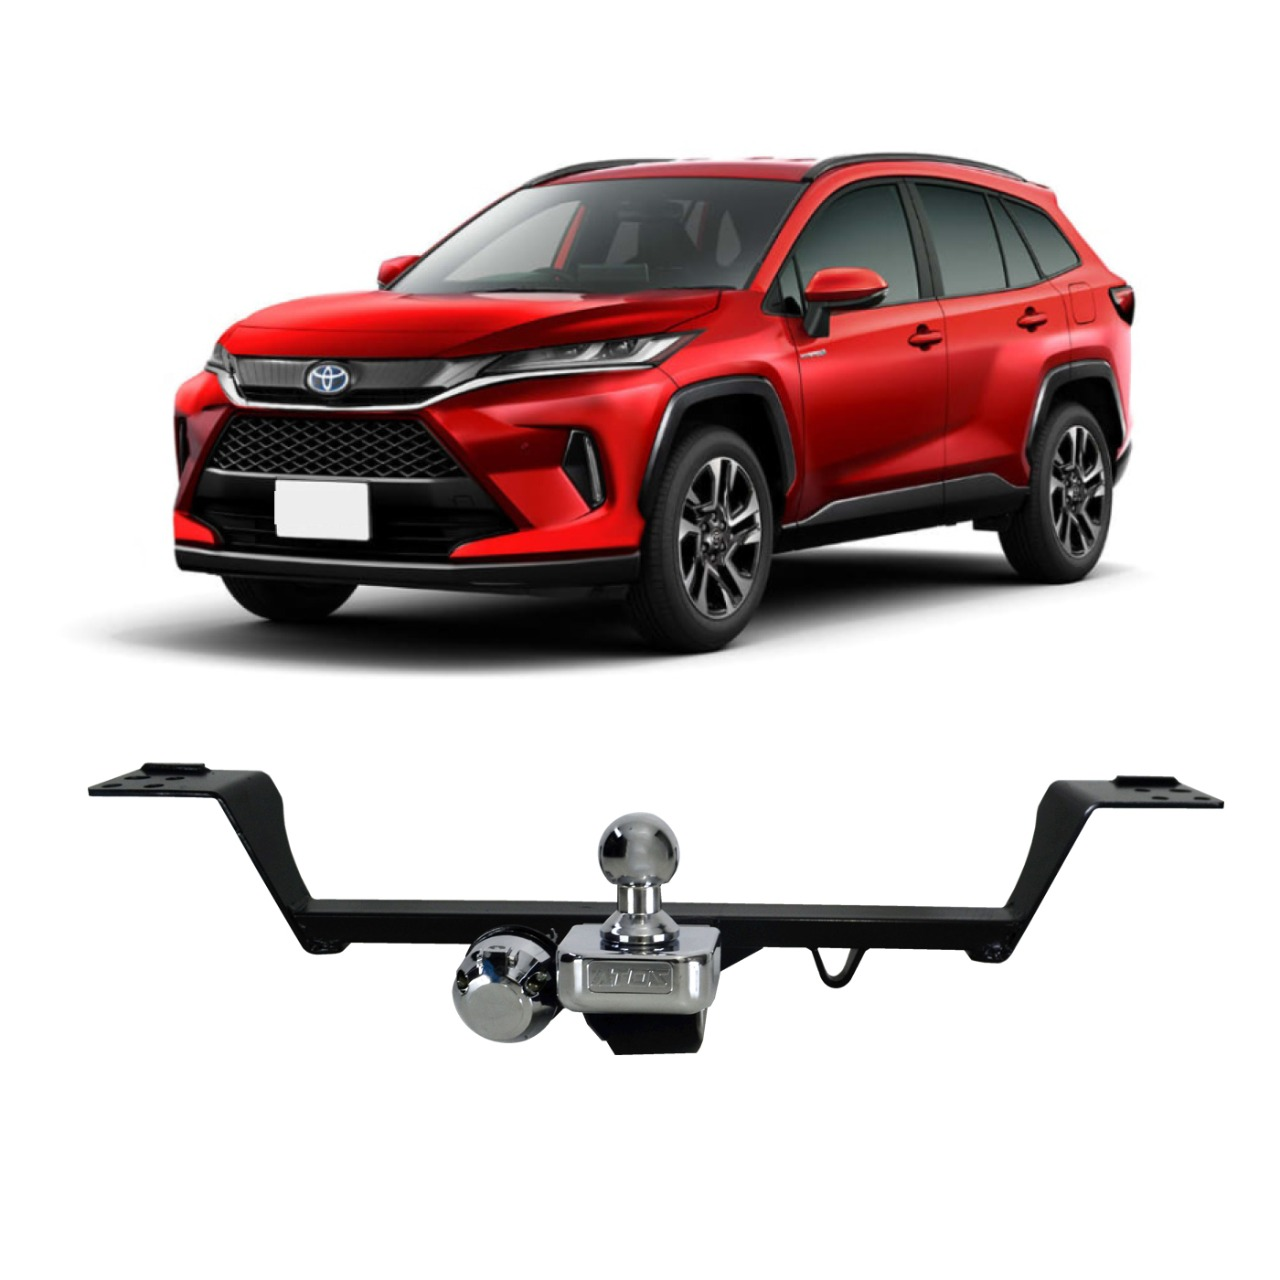 Engate Reboque Toyota Corolla Cross 2021 em Diante Fixo Atos AT-6004